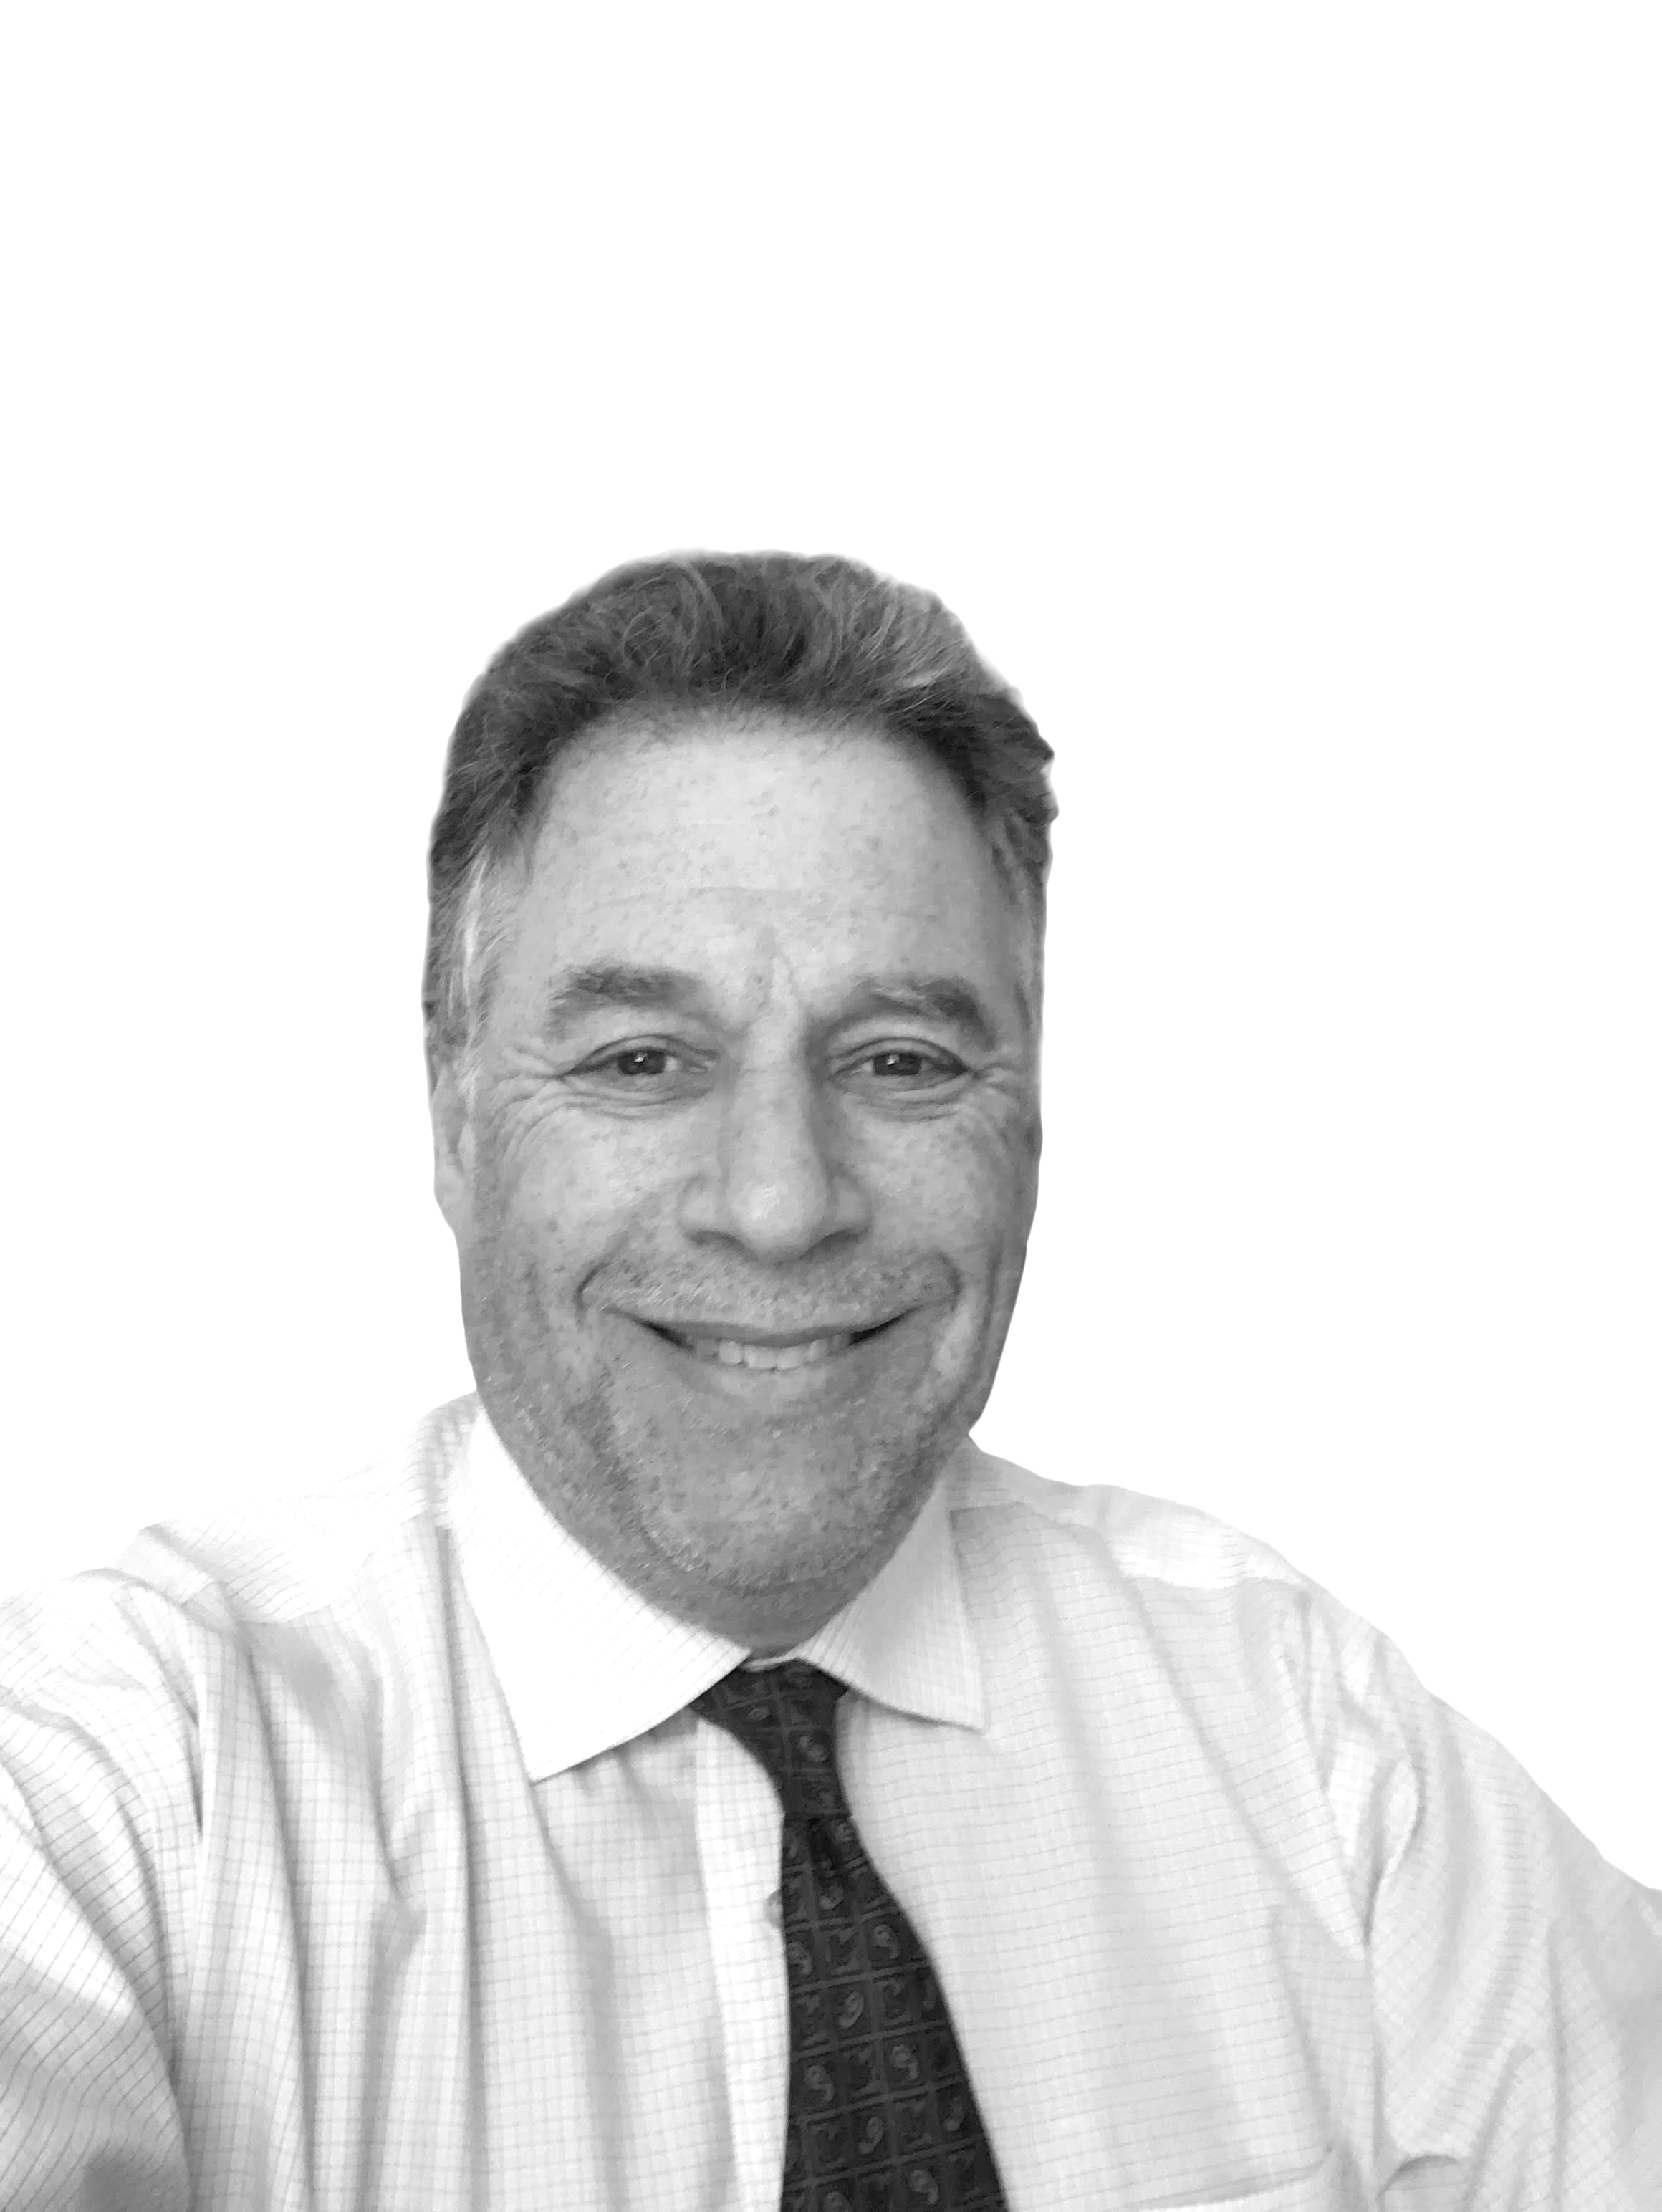 Andy Schechter, Director of Business Development, Power & Utilities